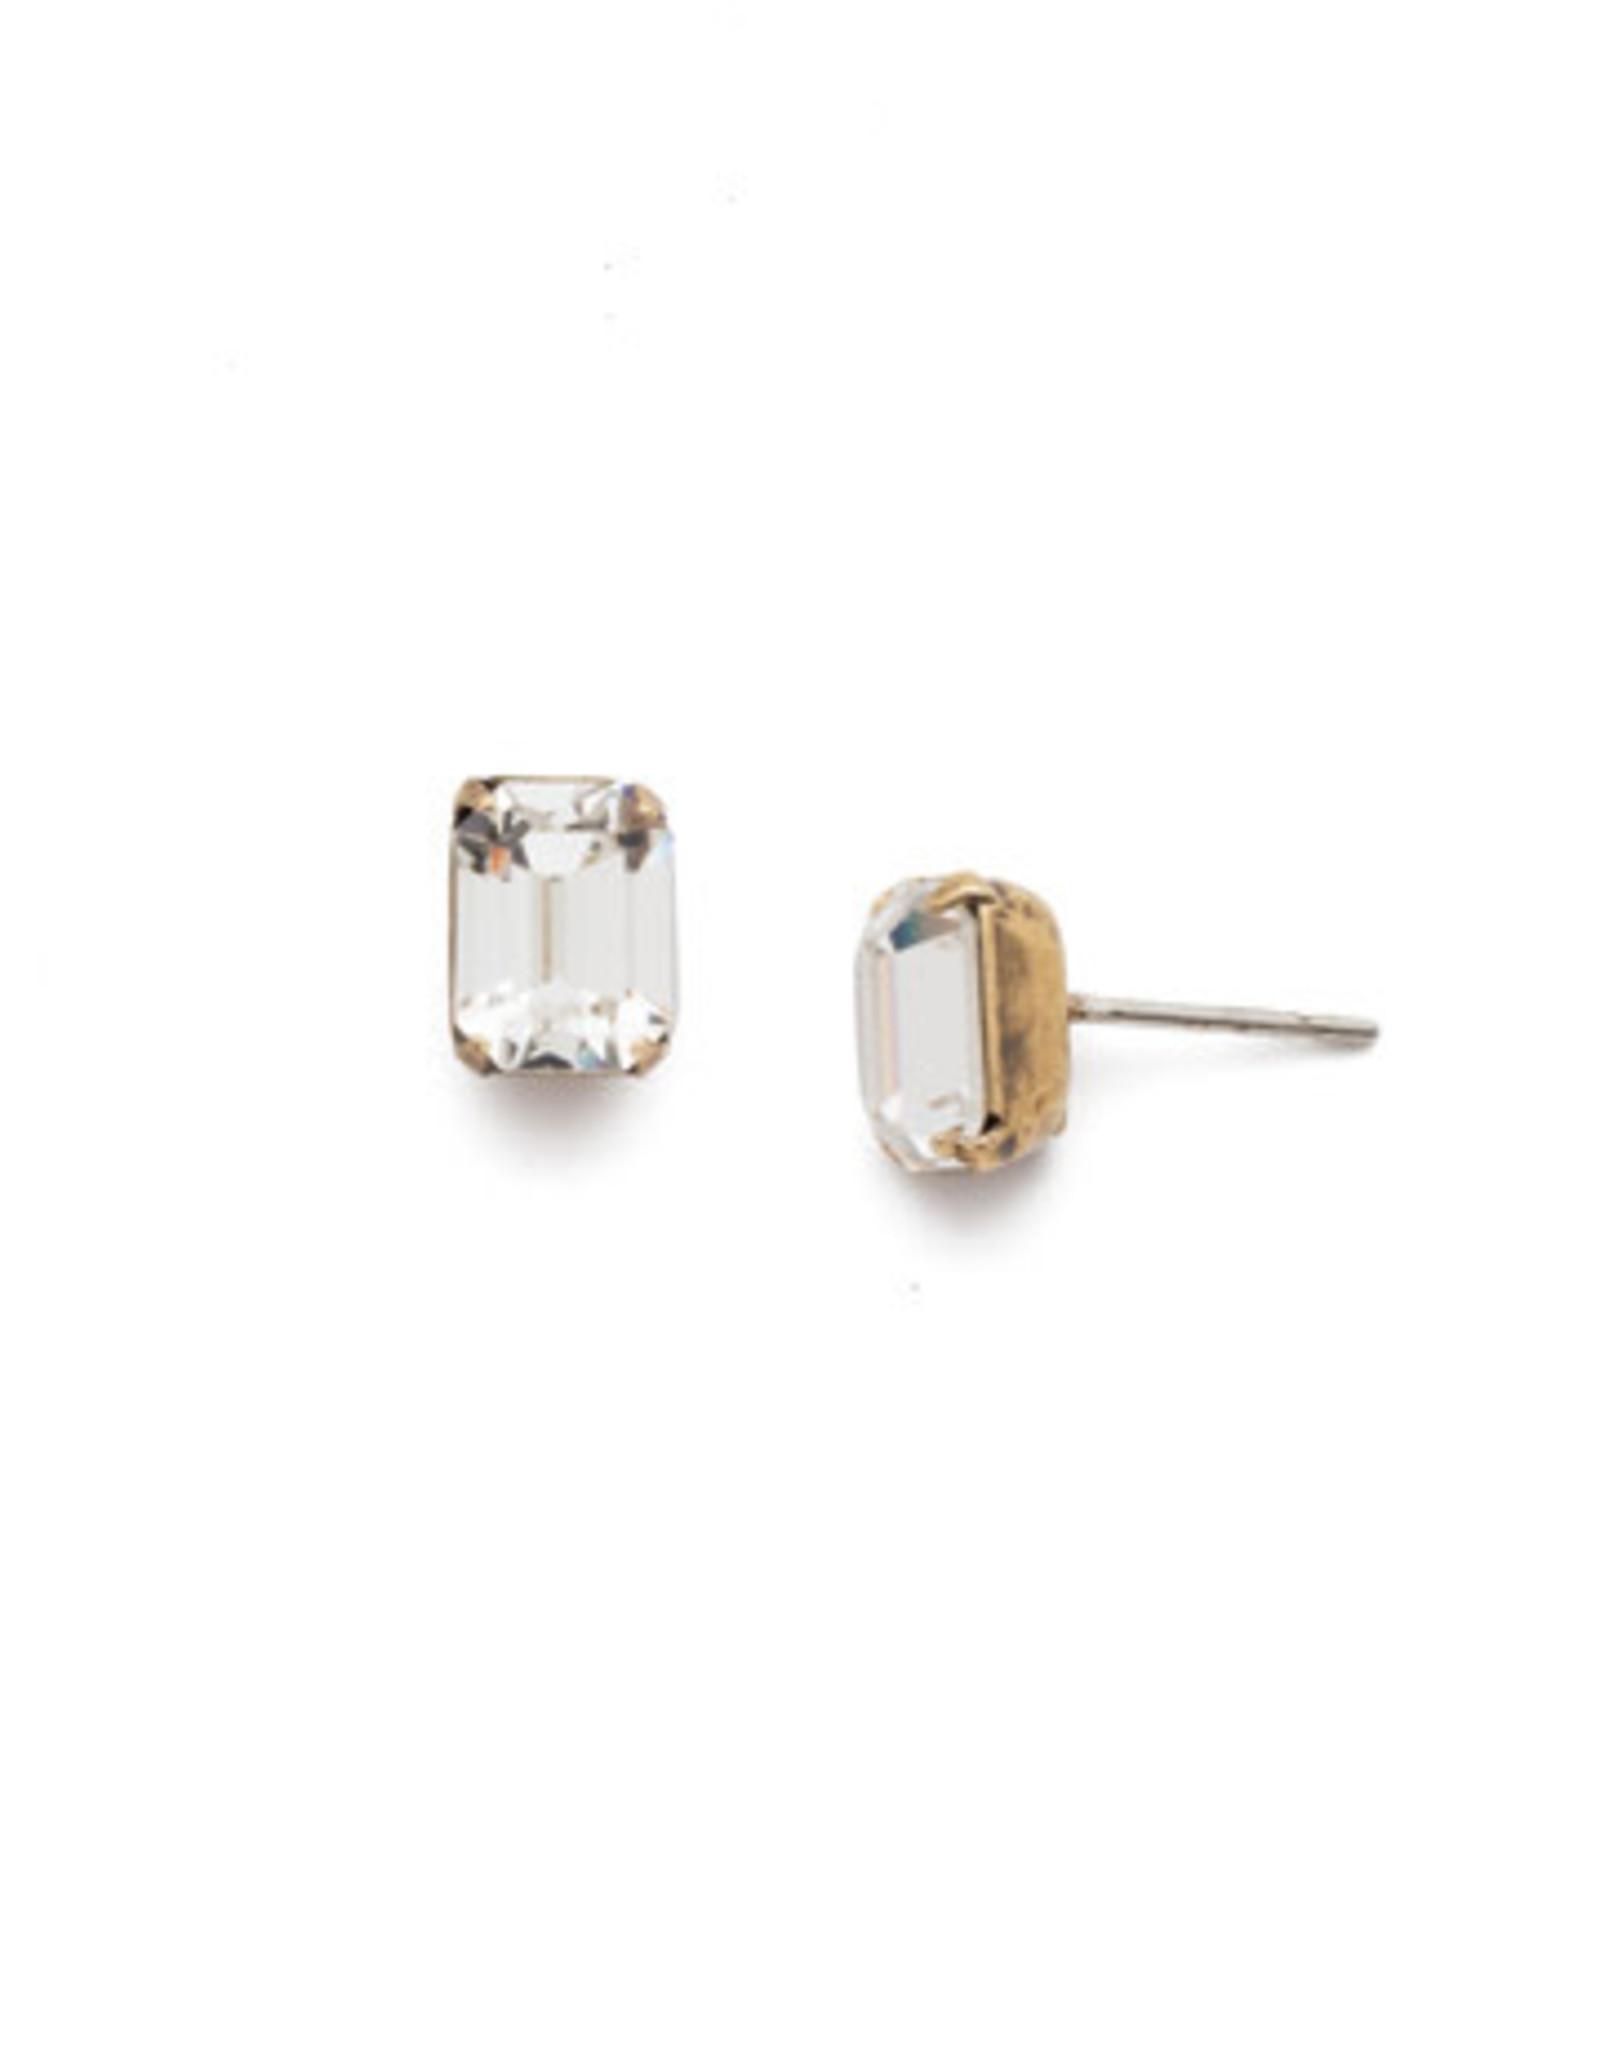 Sorrelli EBY42AGCRY - Crystal Mini Emerald Cut Stud Earring